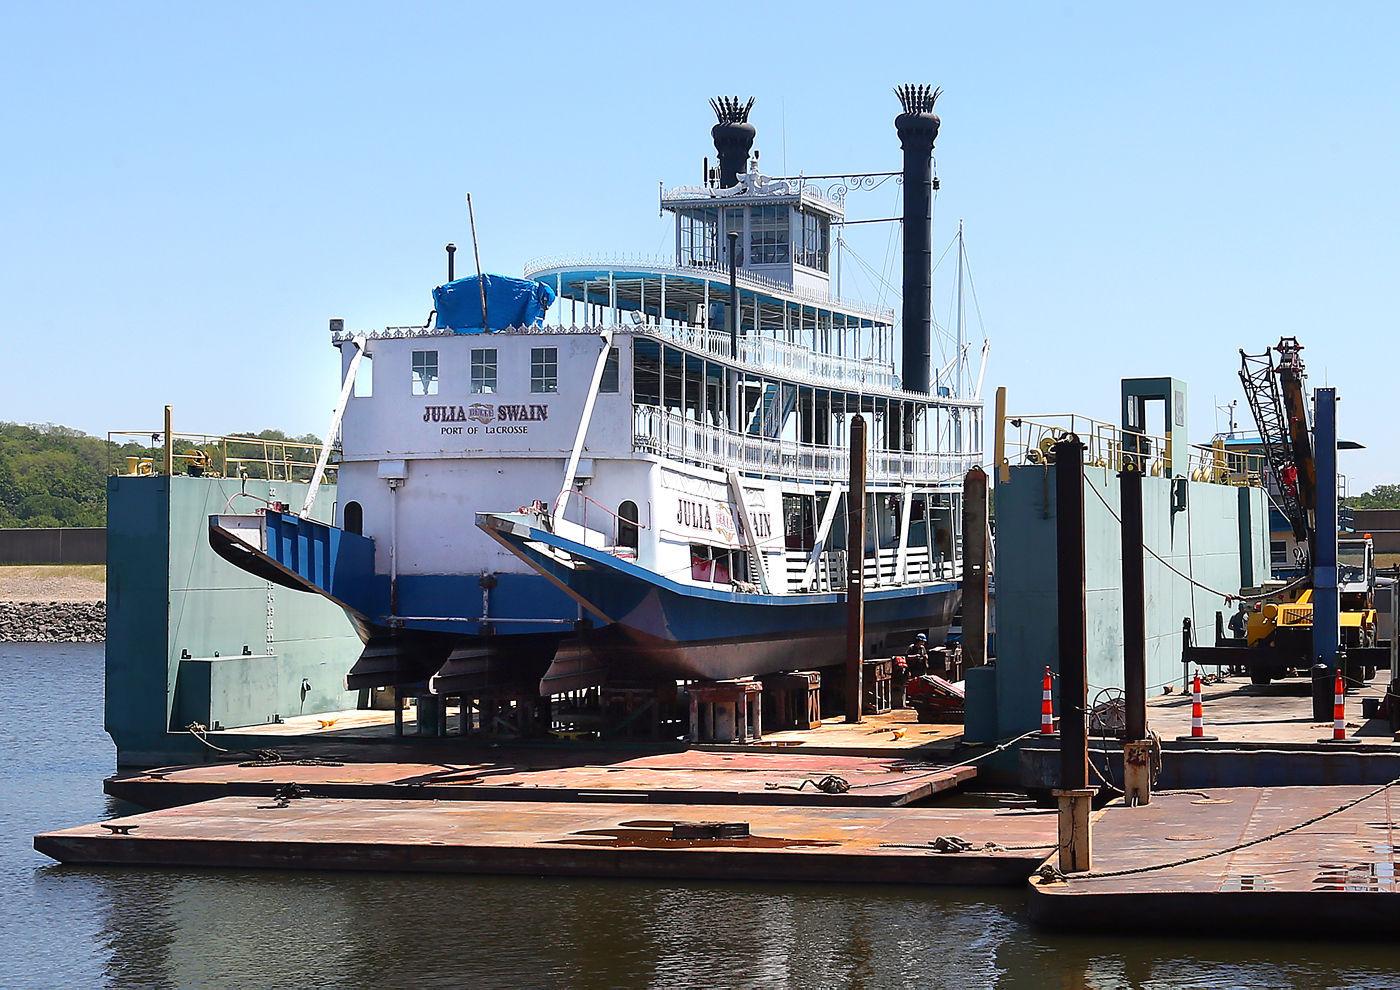 RIVER BOAT BELLE OF LOUISVILLE PADDLE WHEEL STEAMER SHIP SILVER BAR MULTI DECKER